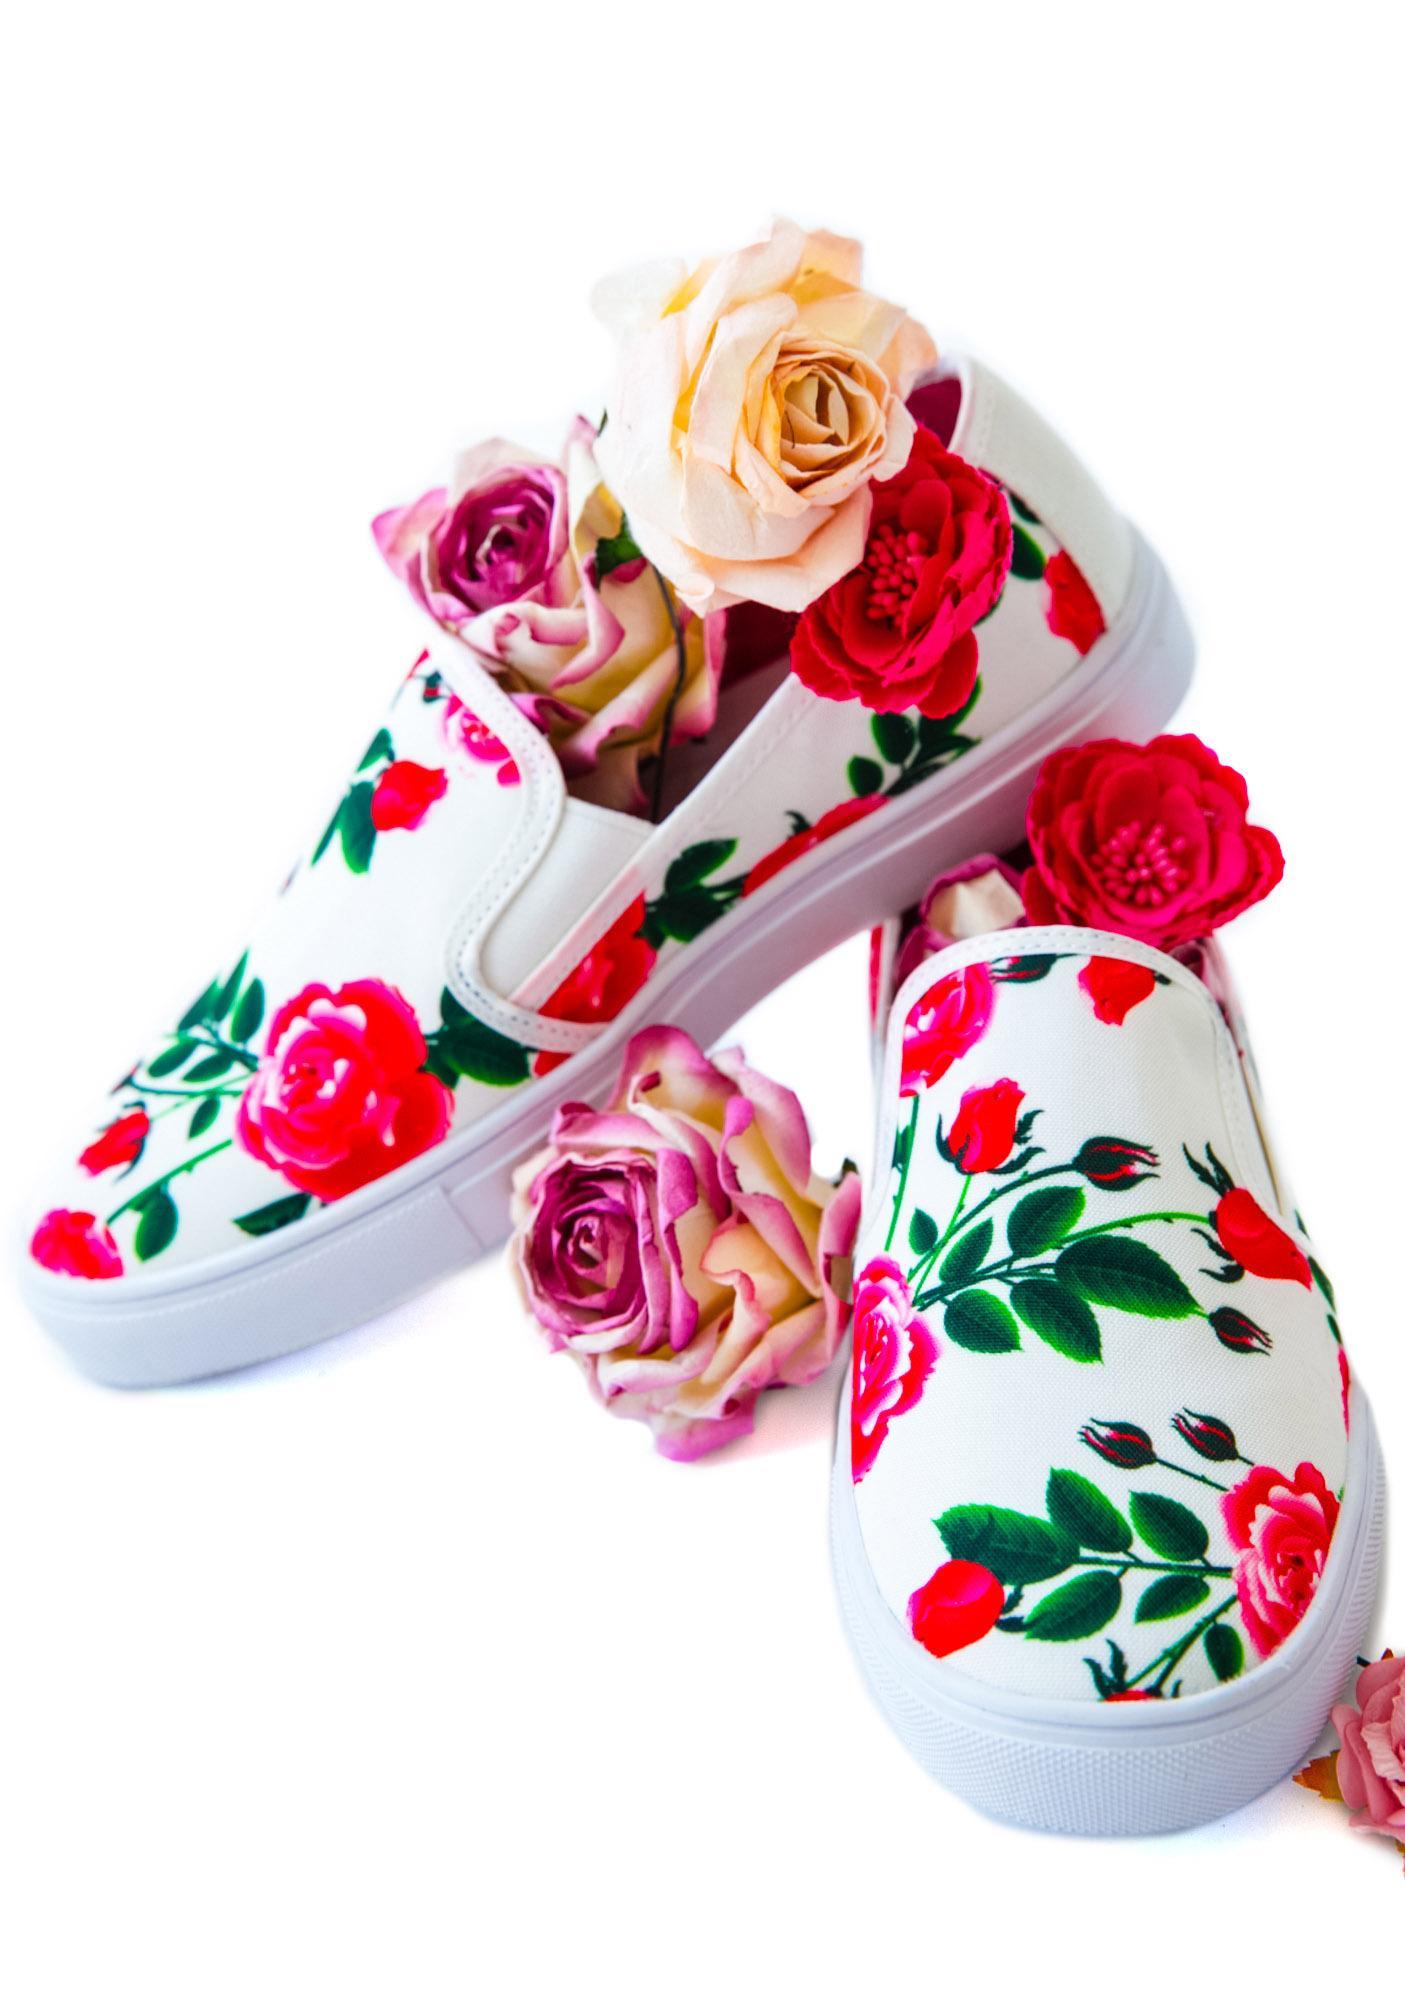 Y.R.U. Chill Floral Slip-On Sneaker